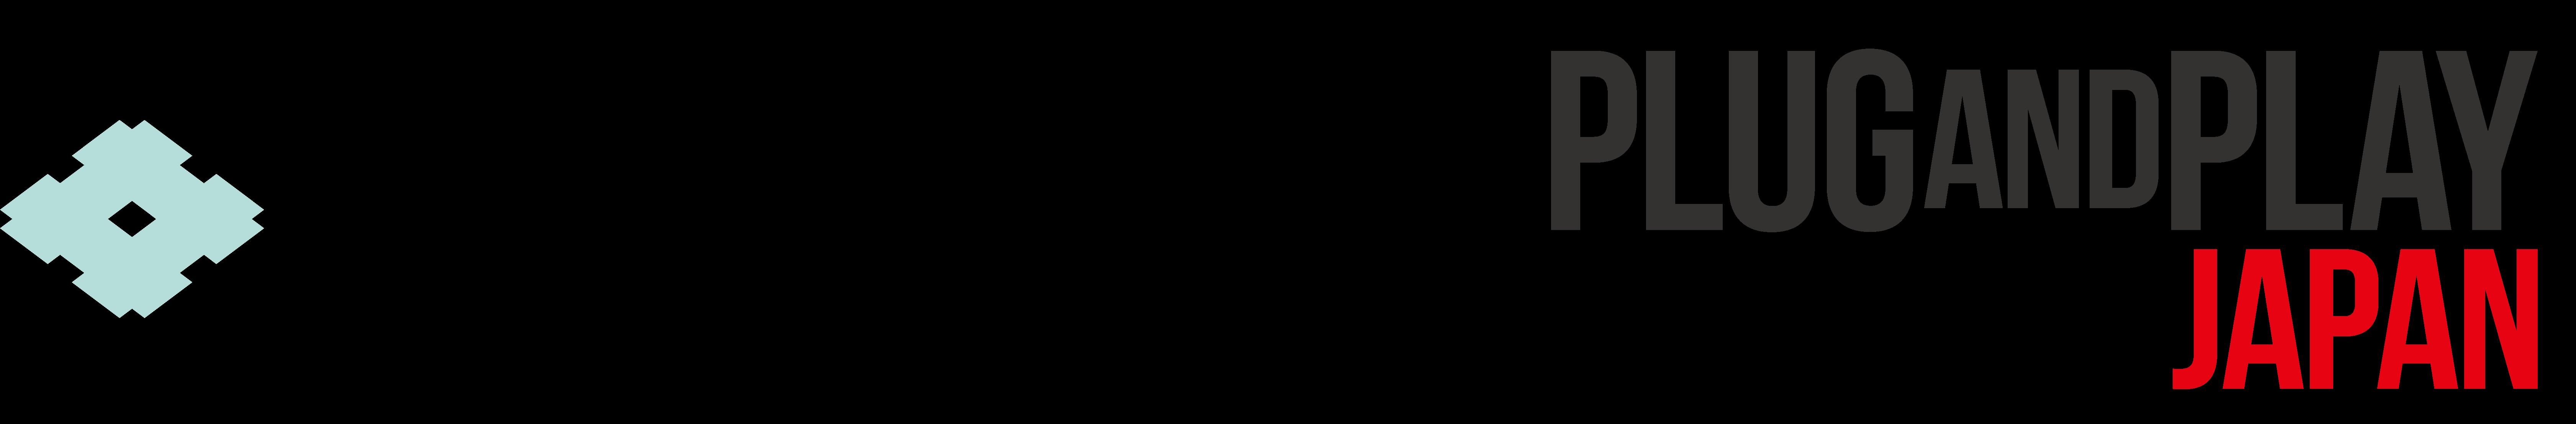 D28153-19-261732-0